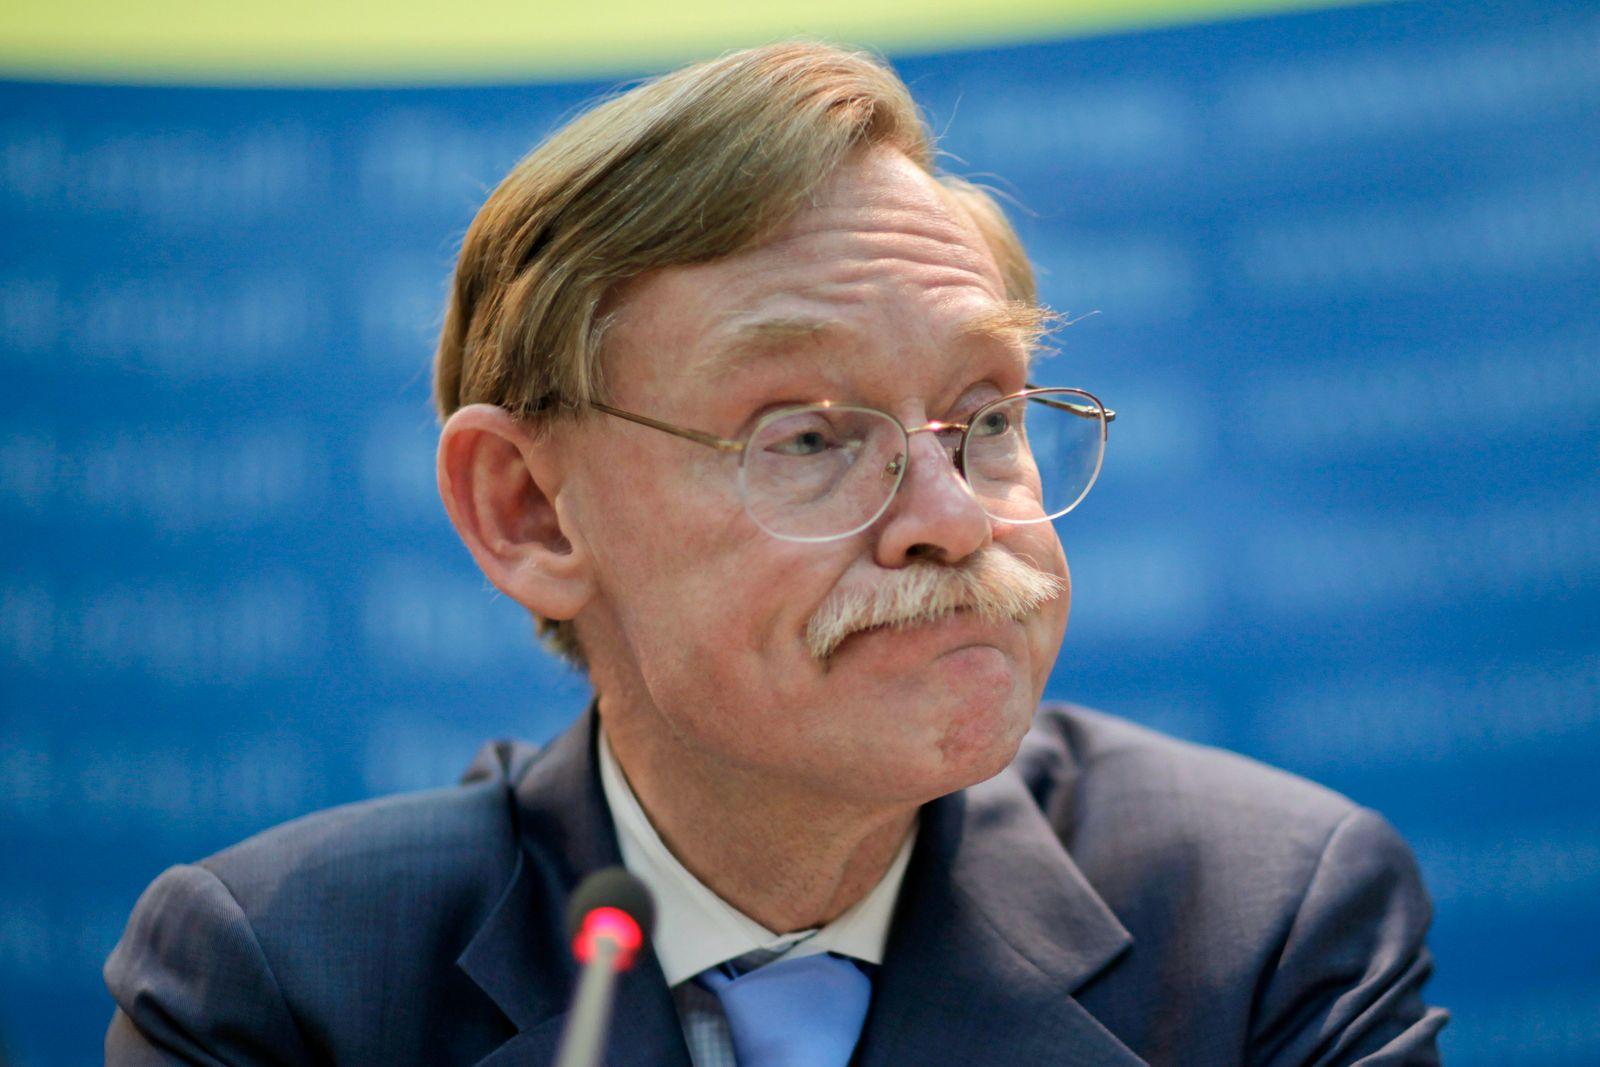 Robert Zoellick / Präsident Weltbank